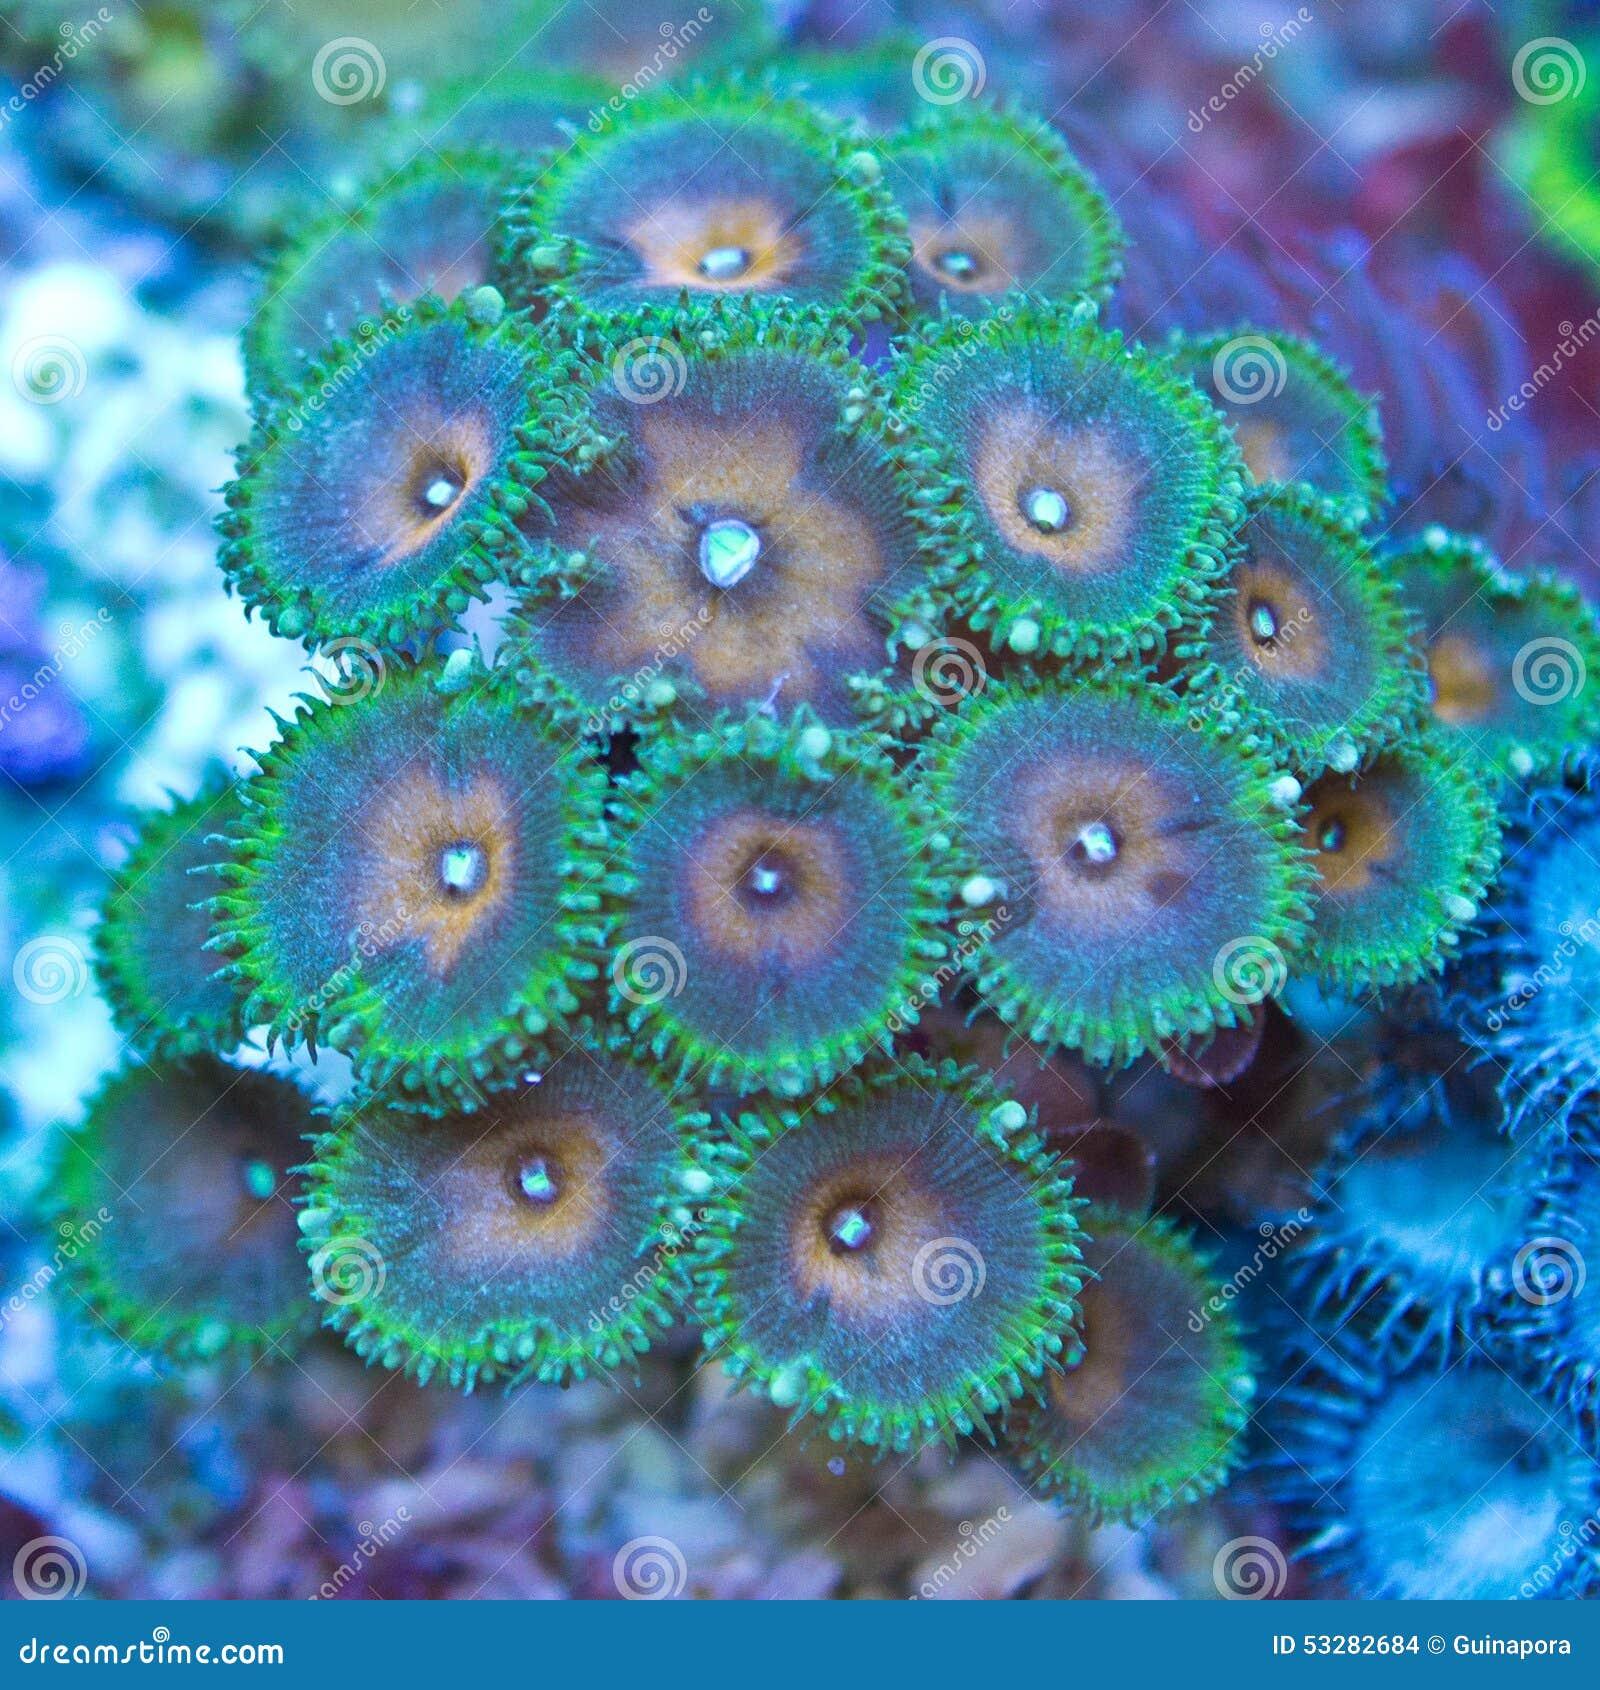 Palythoa polyps